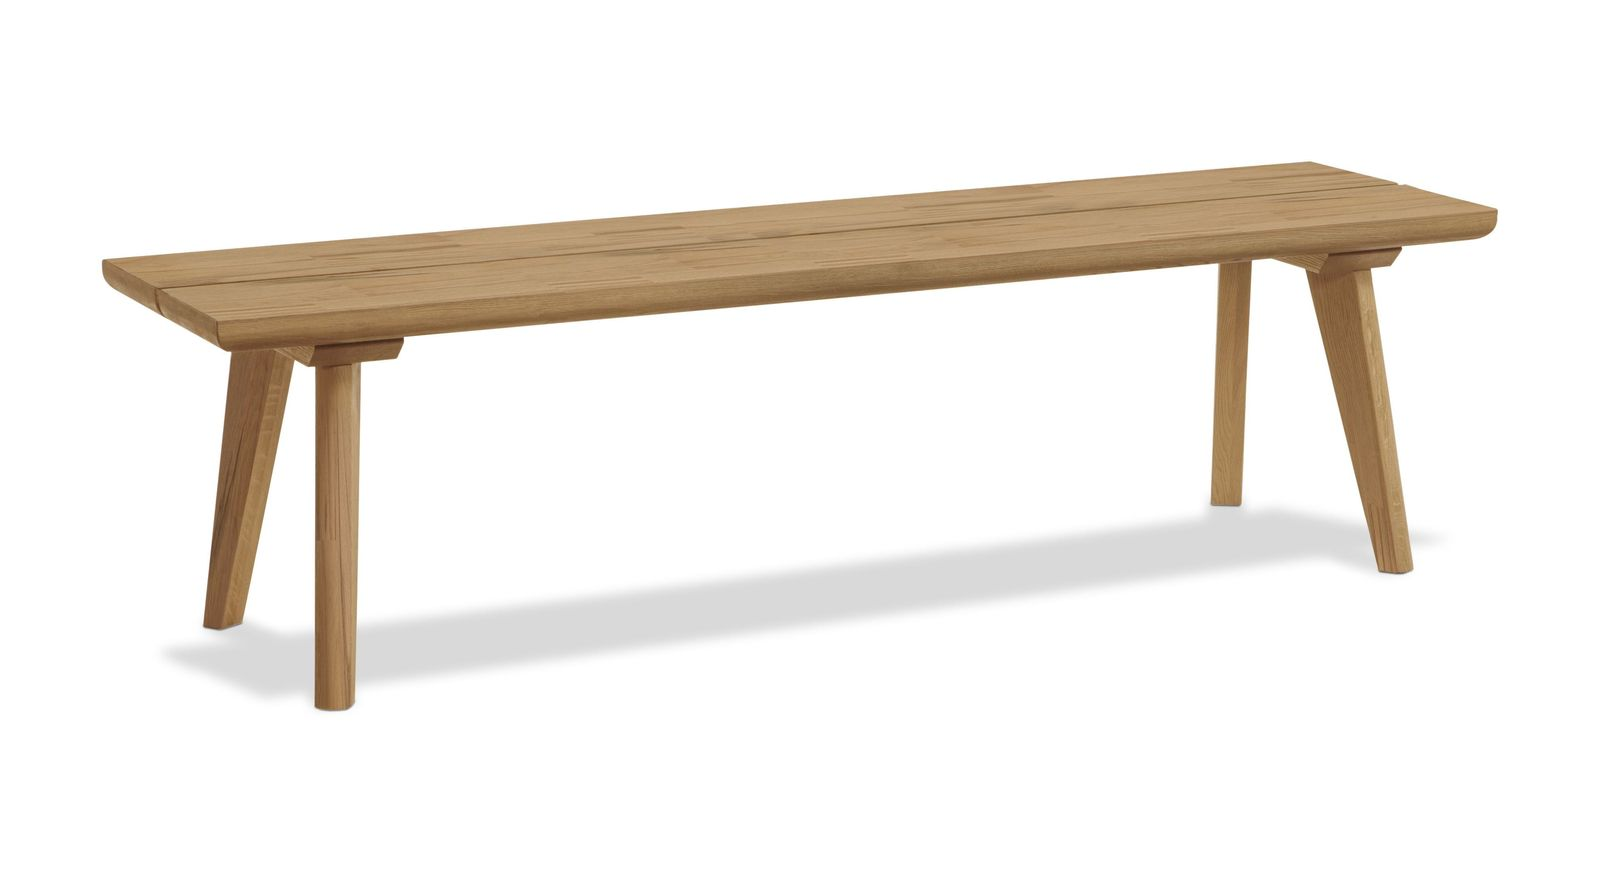 Retro Bettbank Ballina gefertigt aus Massivholz